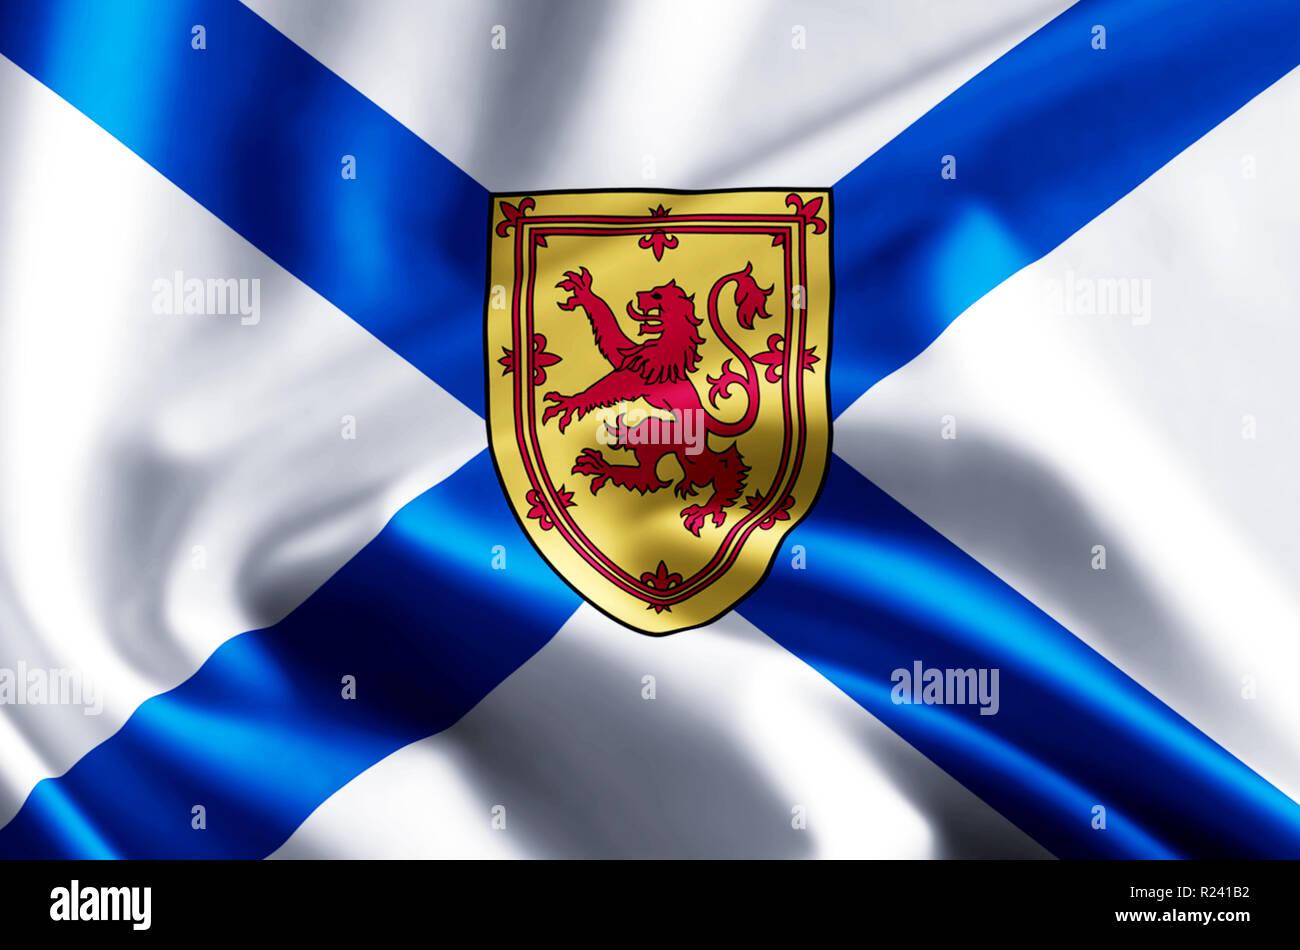 Nova Scotia Flag High Resolution Stock Photography And Images Alamy